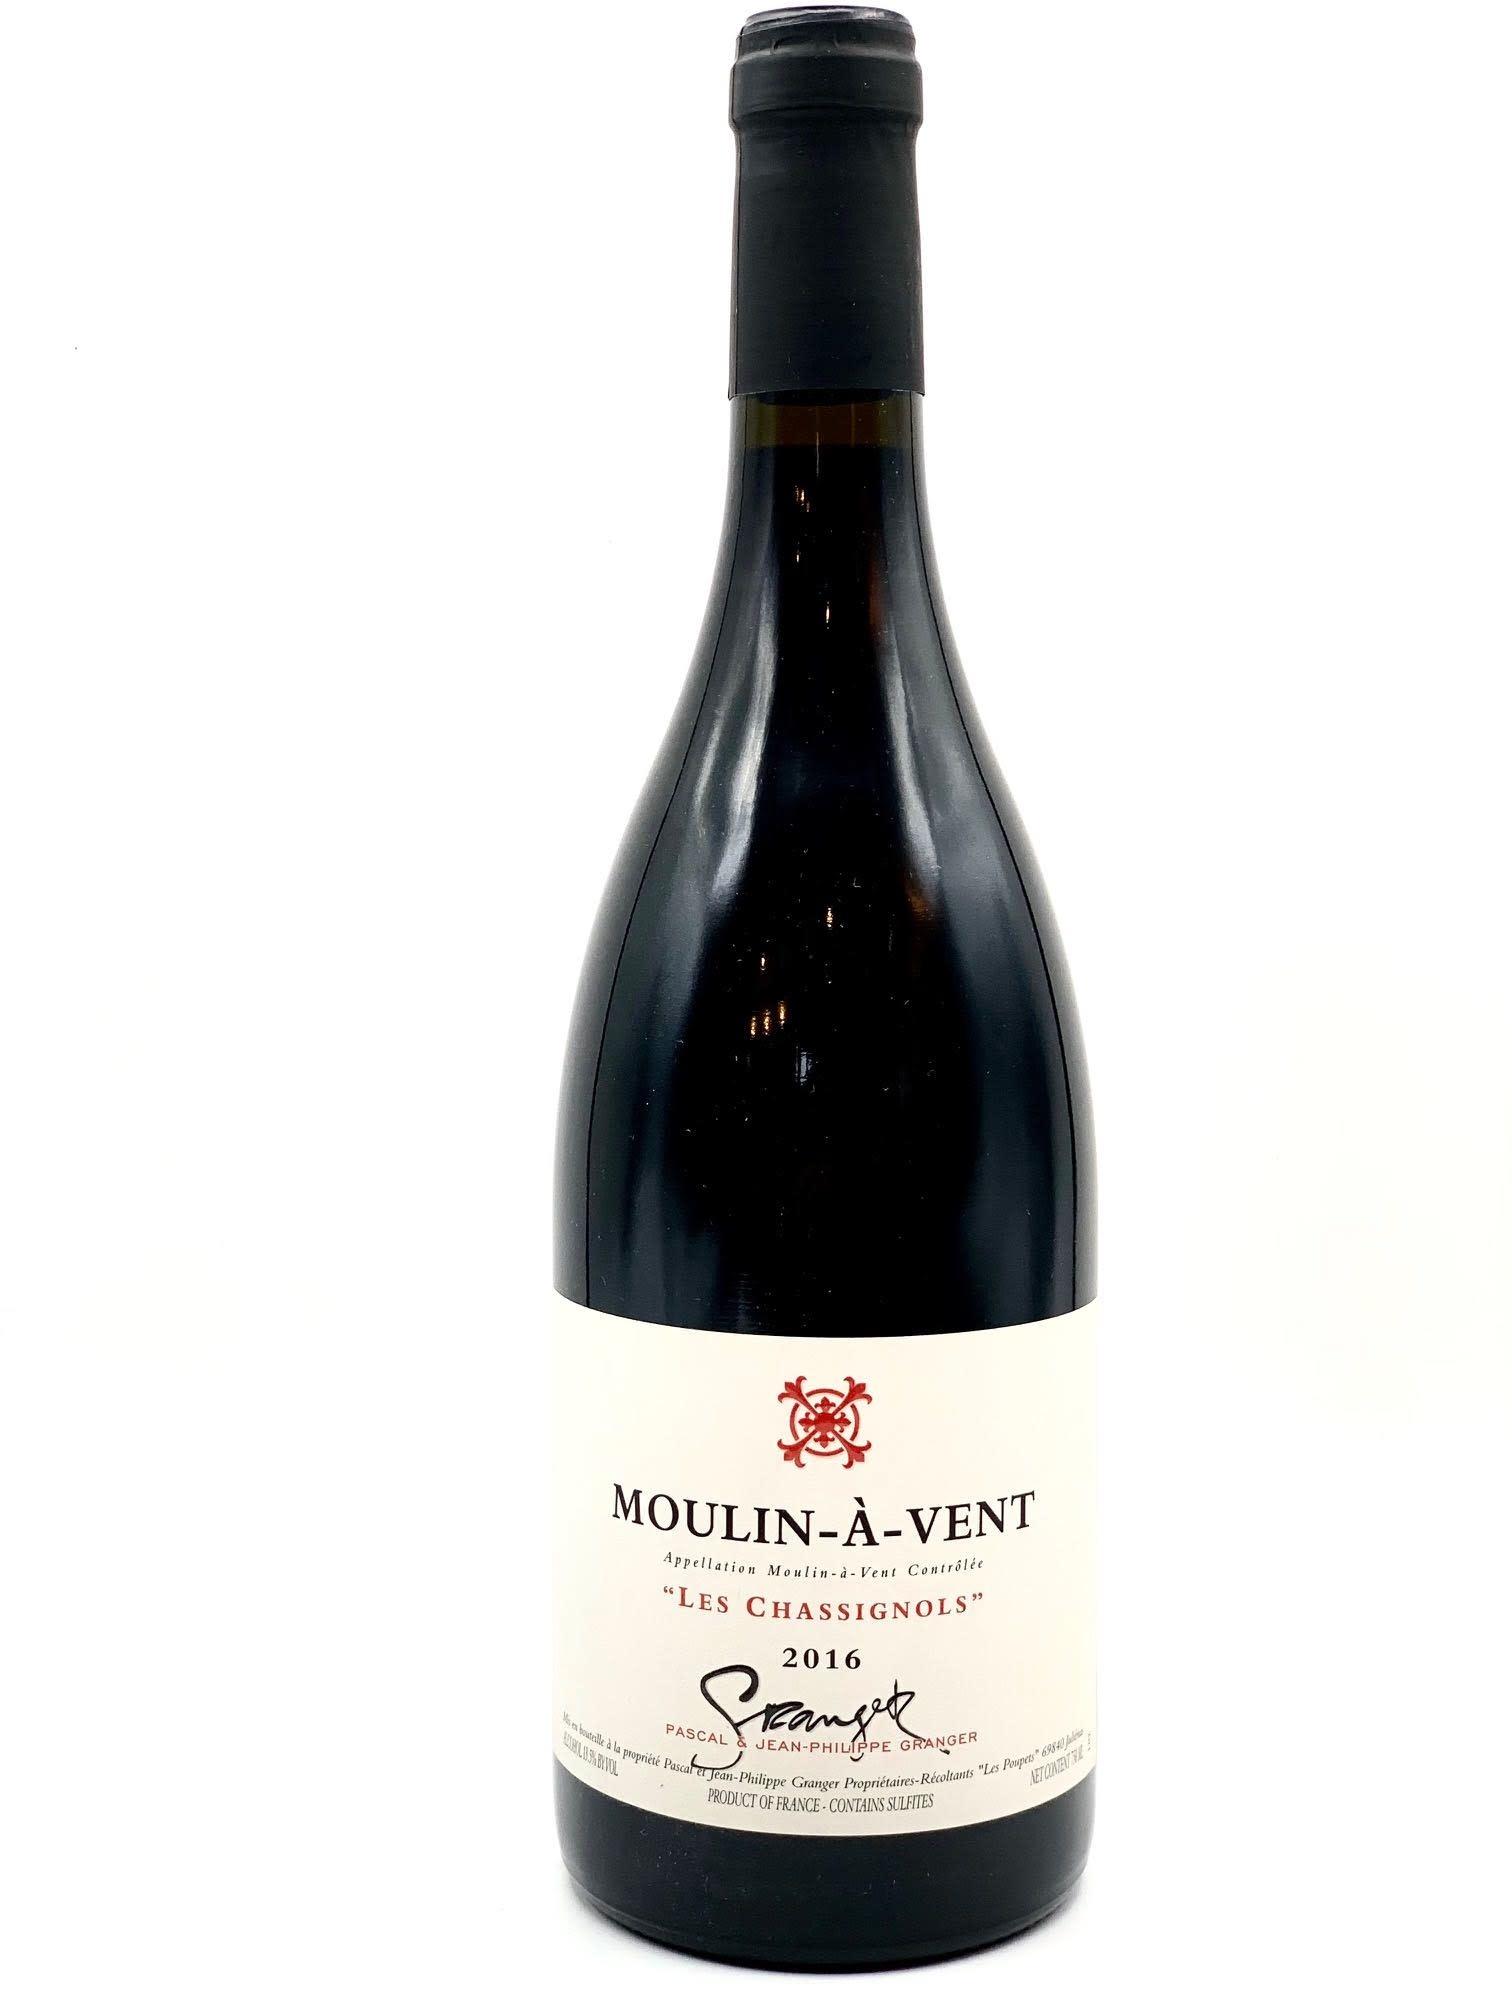 "Beaujolais-Moulin A Vent 2016/17 Pascal & Jean-Philippe Granger ""Les Chassignols"" 750ml"